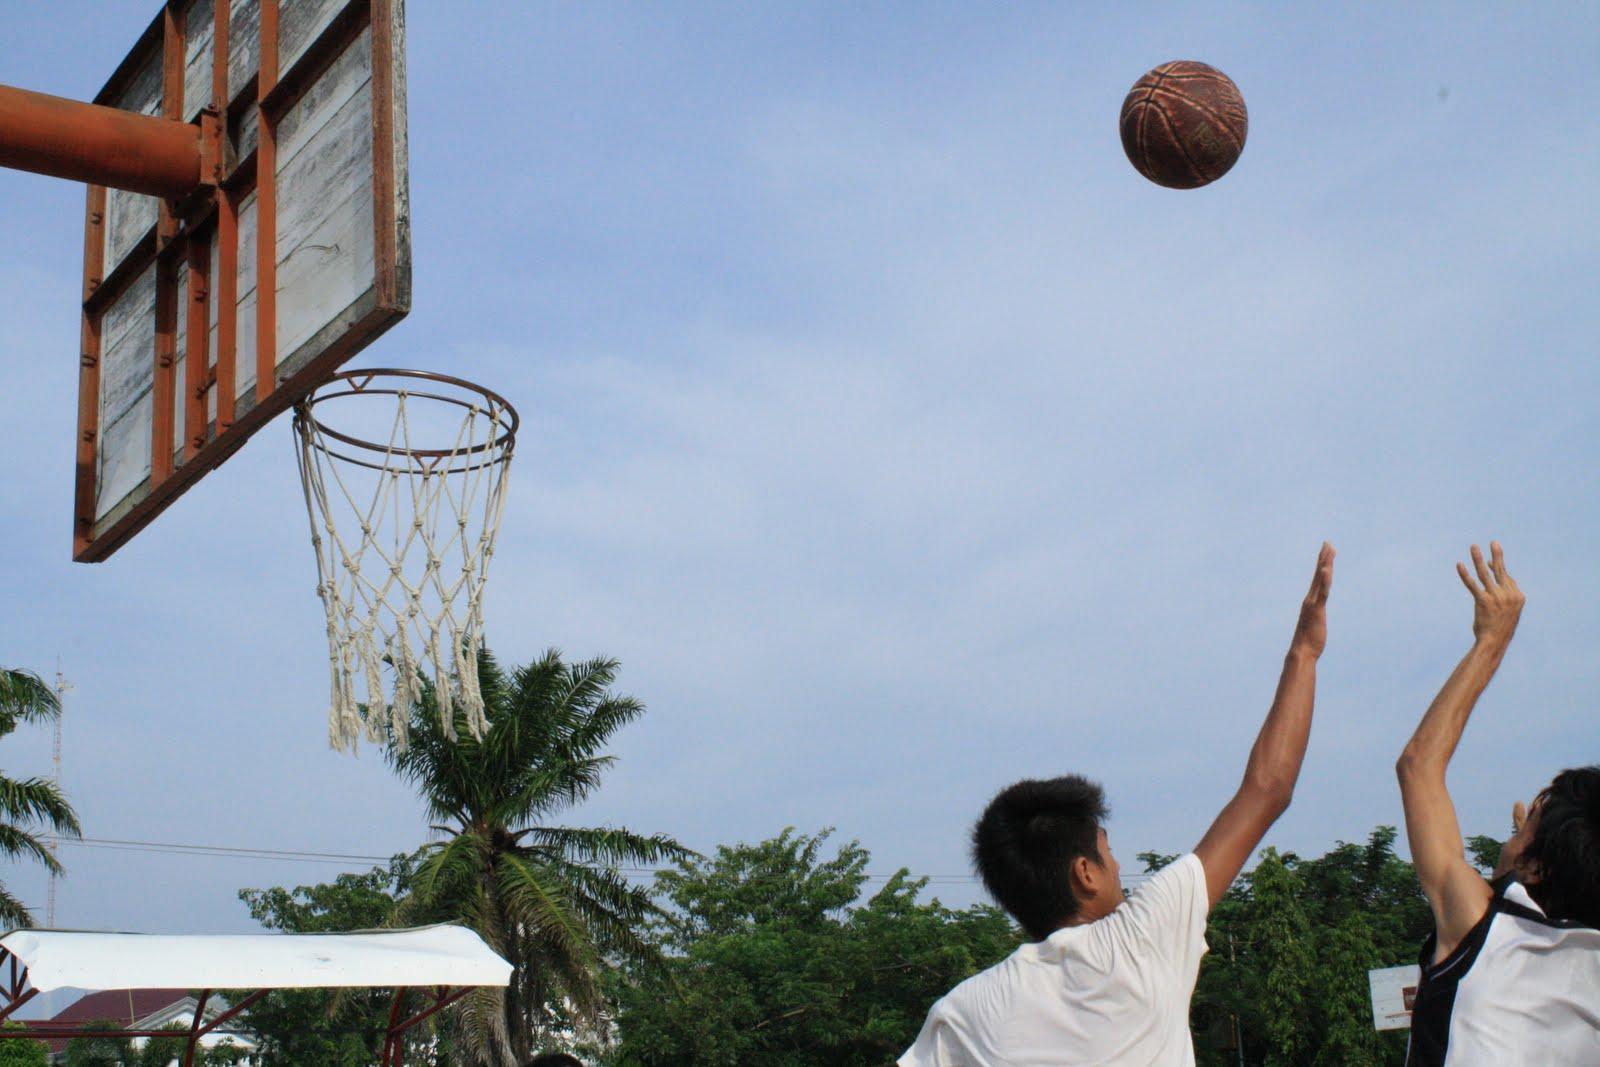 Banda Aceh Basket Era 1990 Olah Raga Bola Lapangan Blang